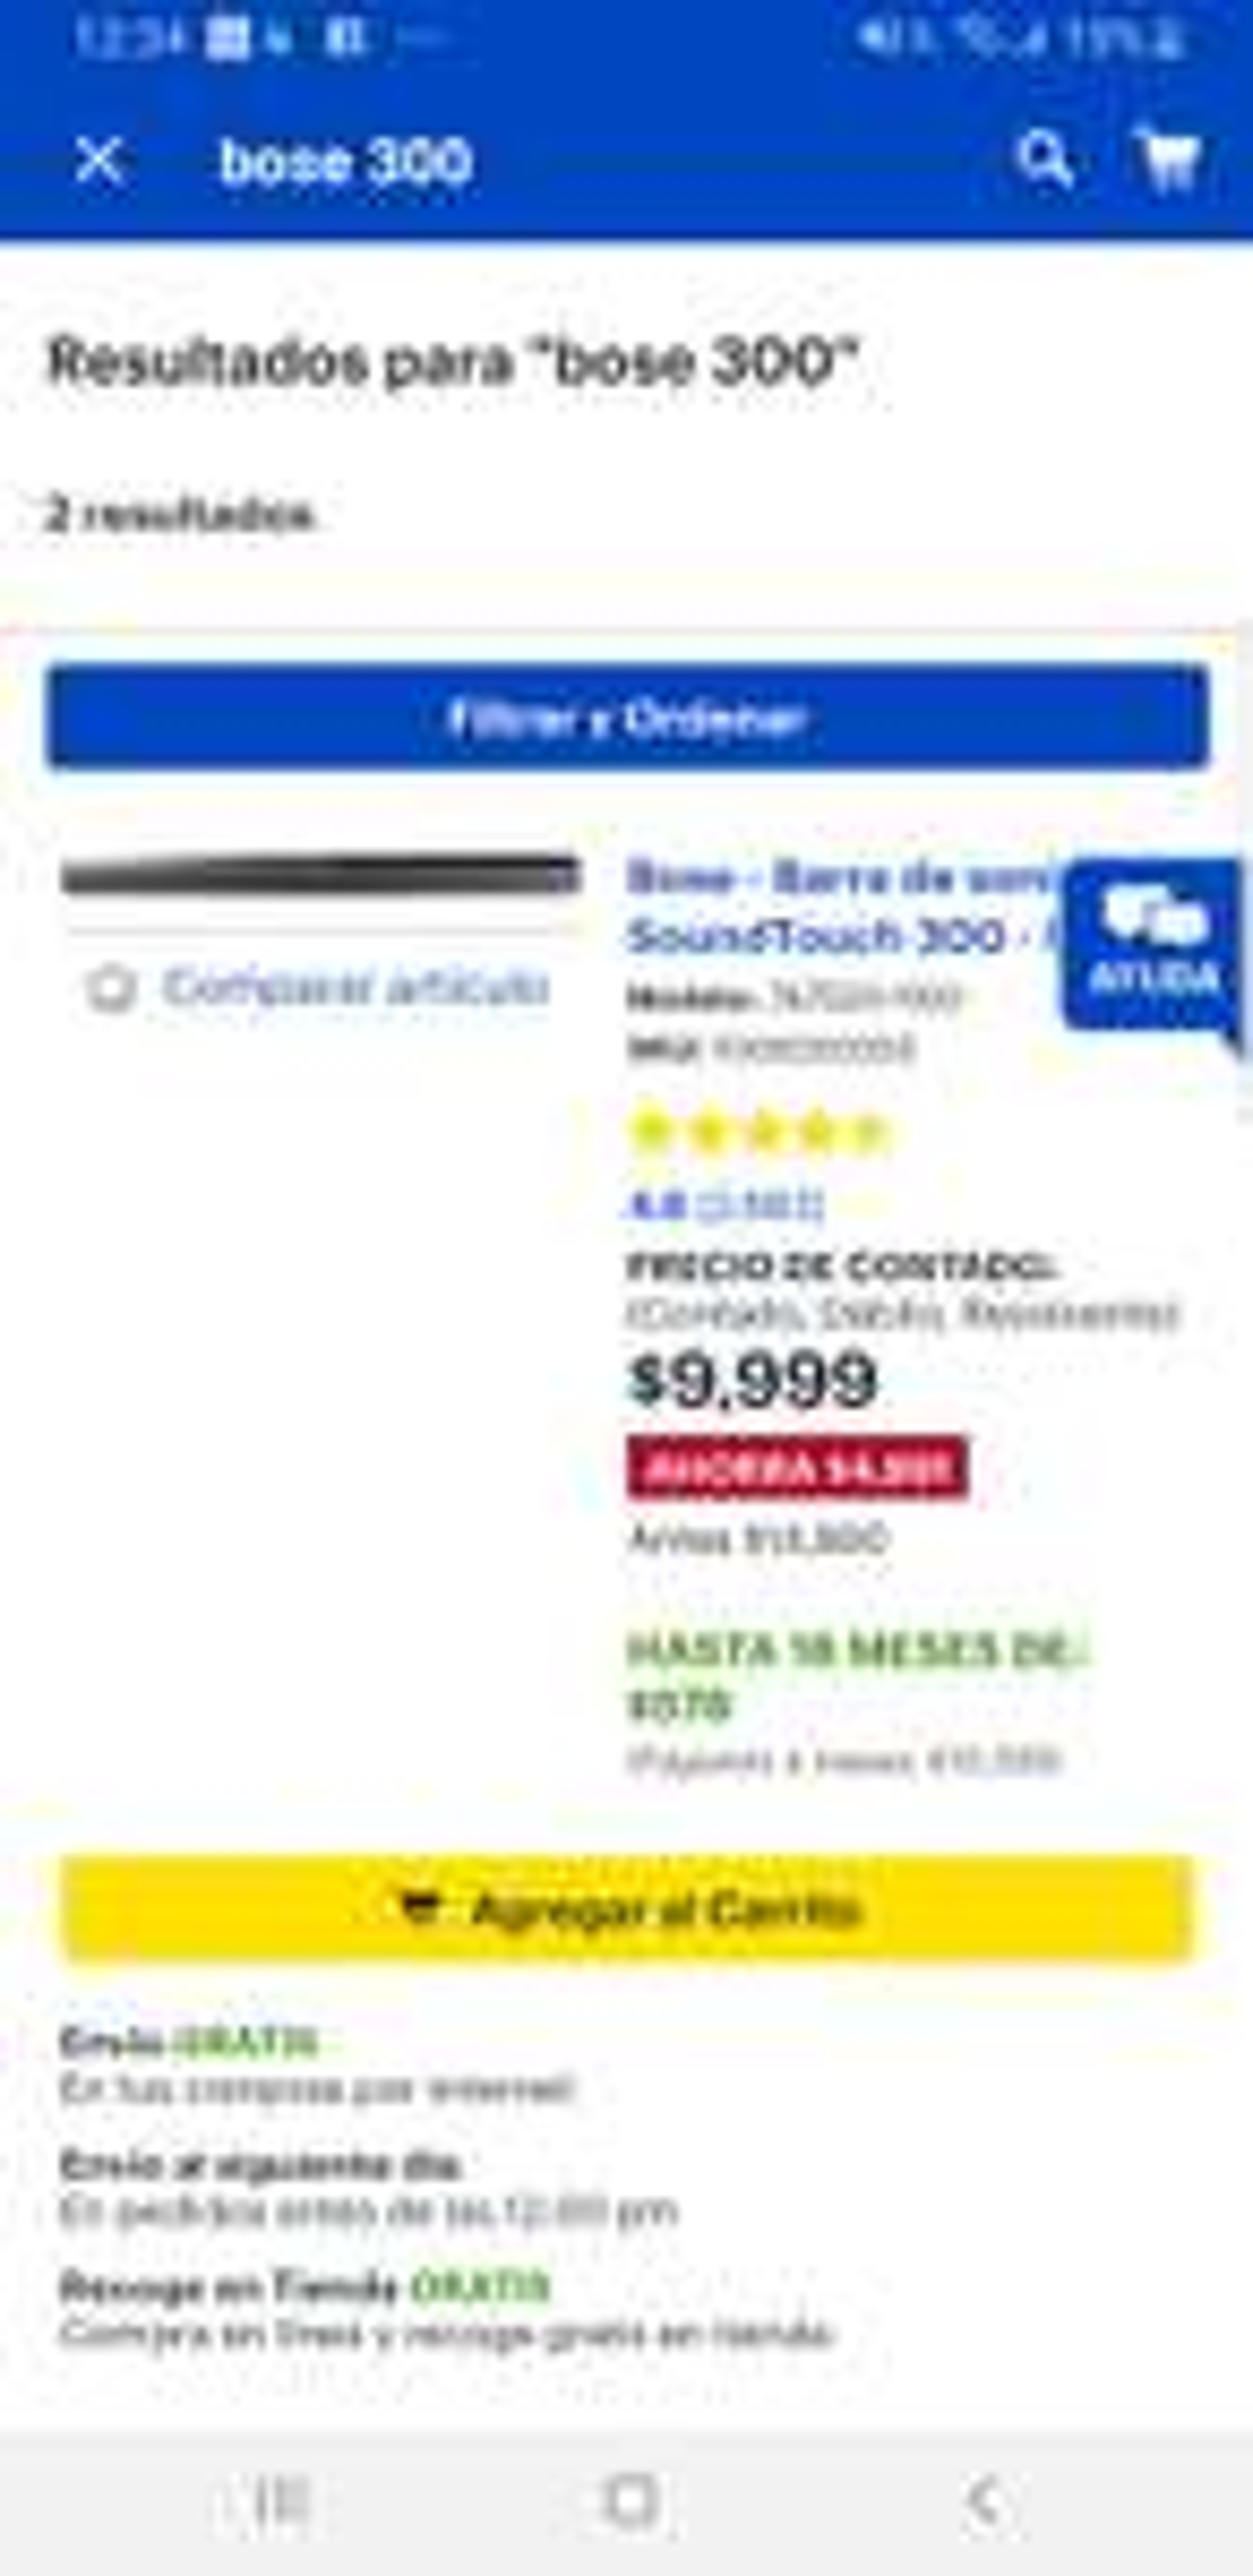 Best Buy: Barra de sonido Bose SoudTouch 300